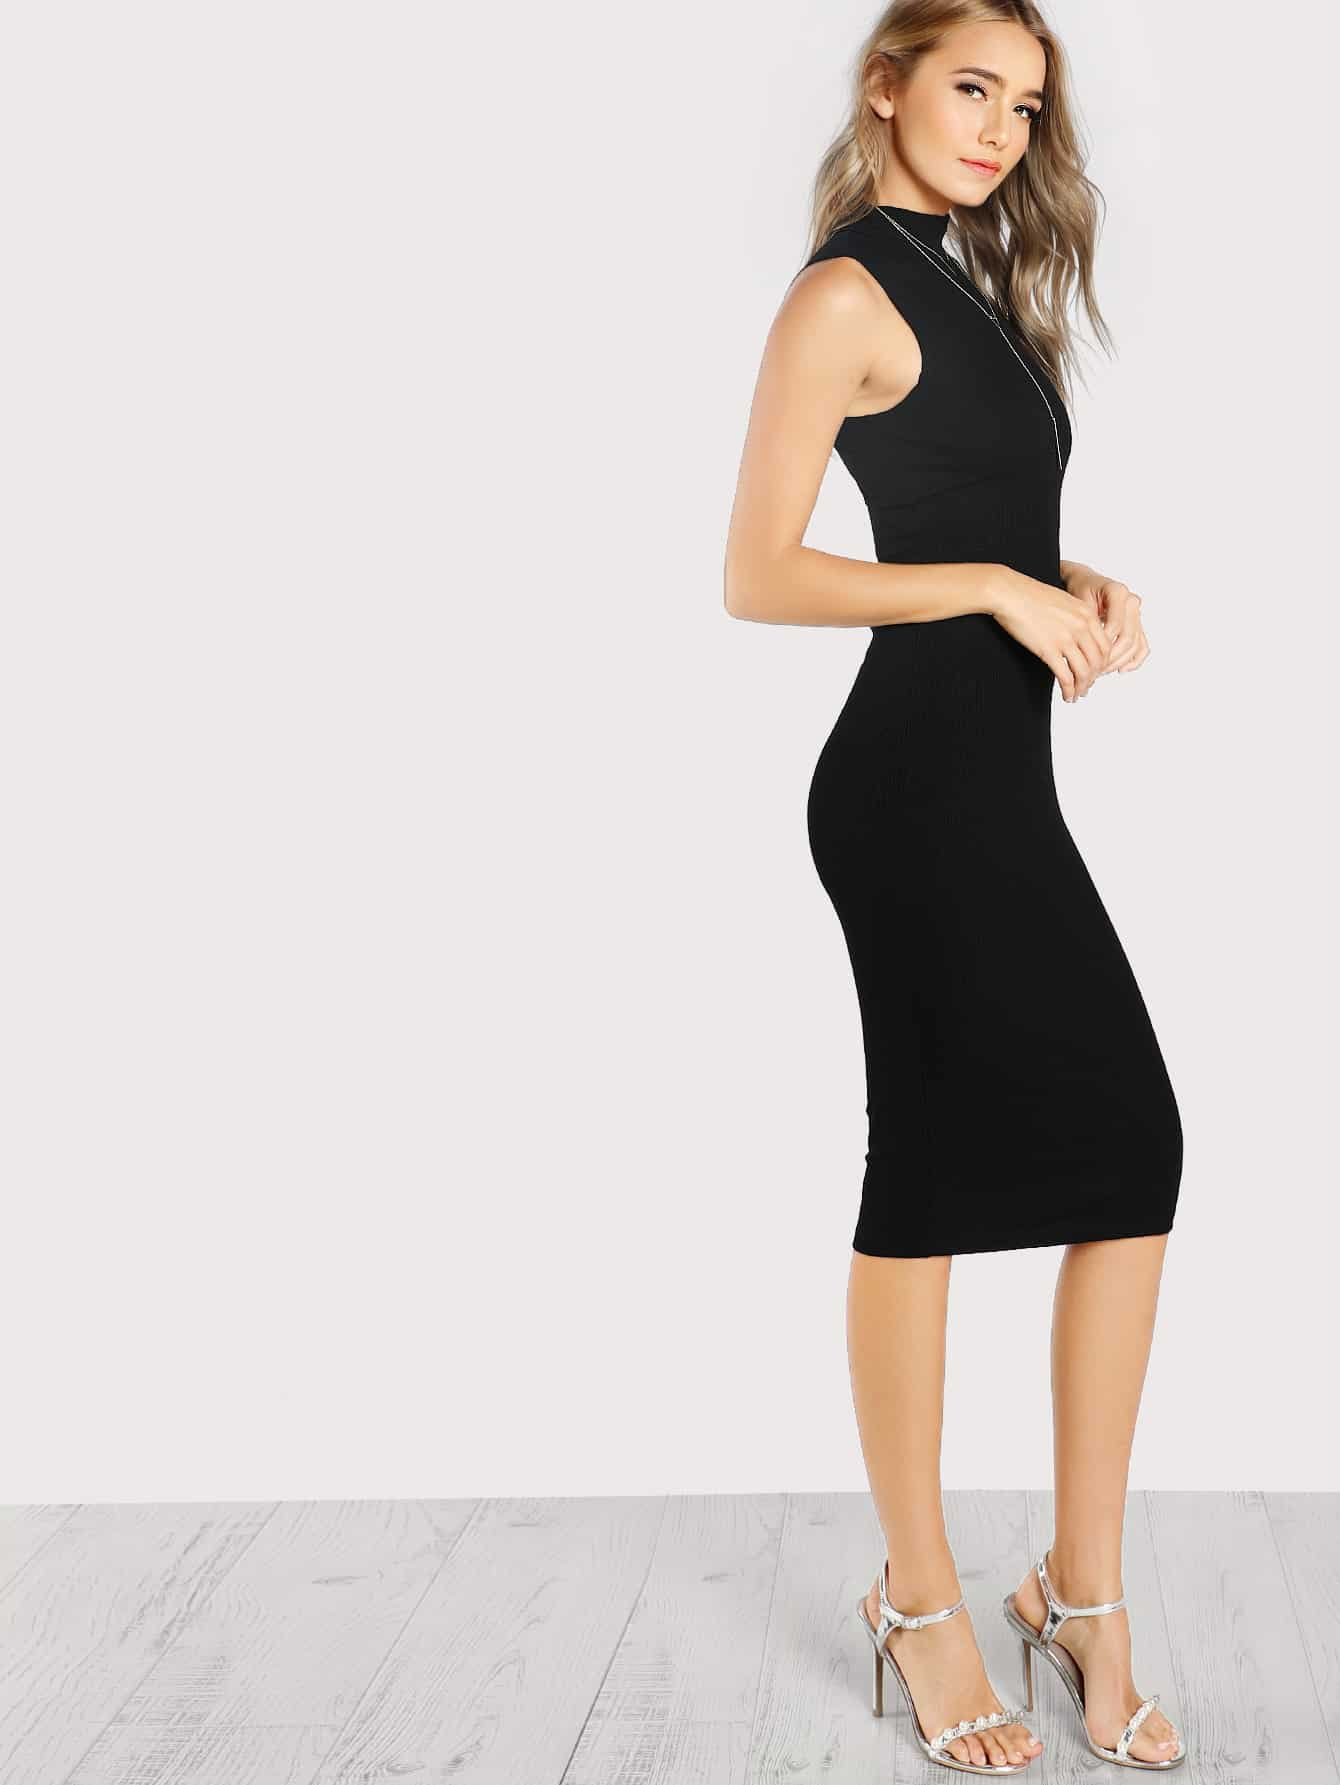 Bodycon Sleeveless Dresses Plain Neck High urban midi ebay